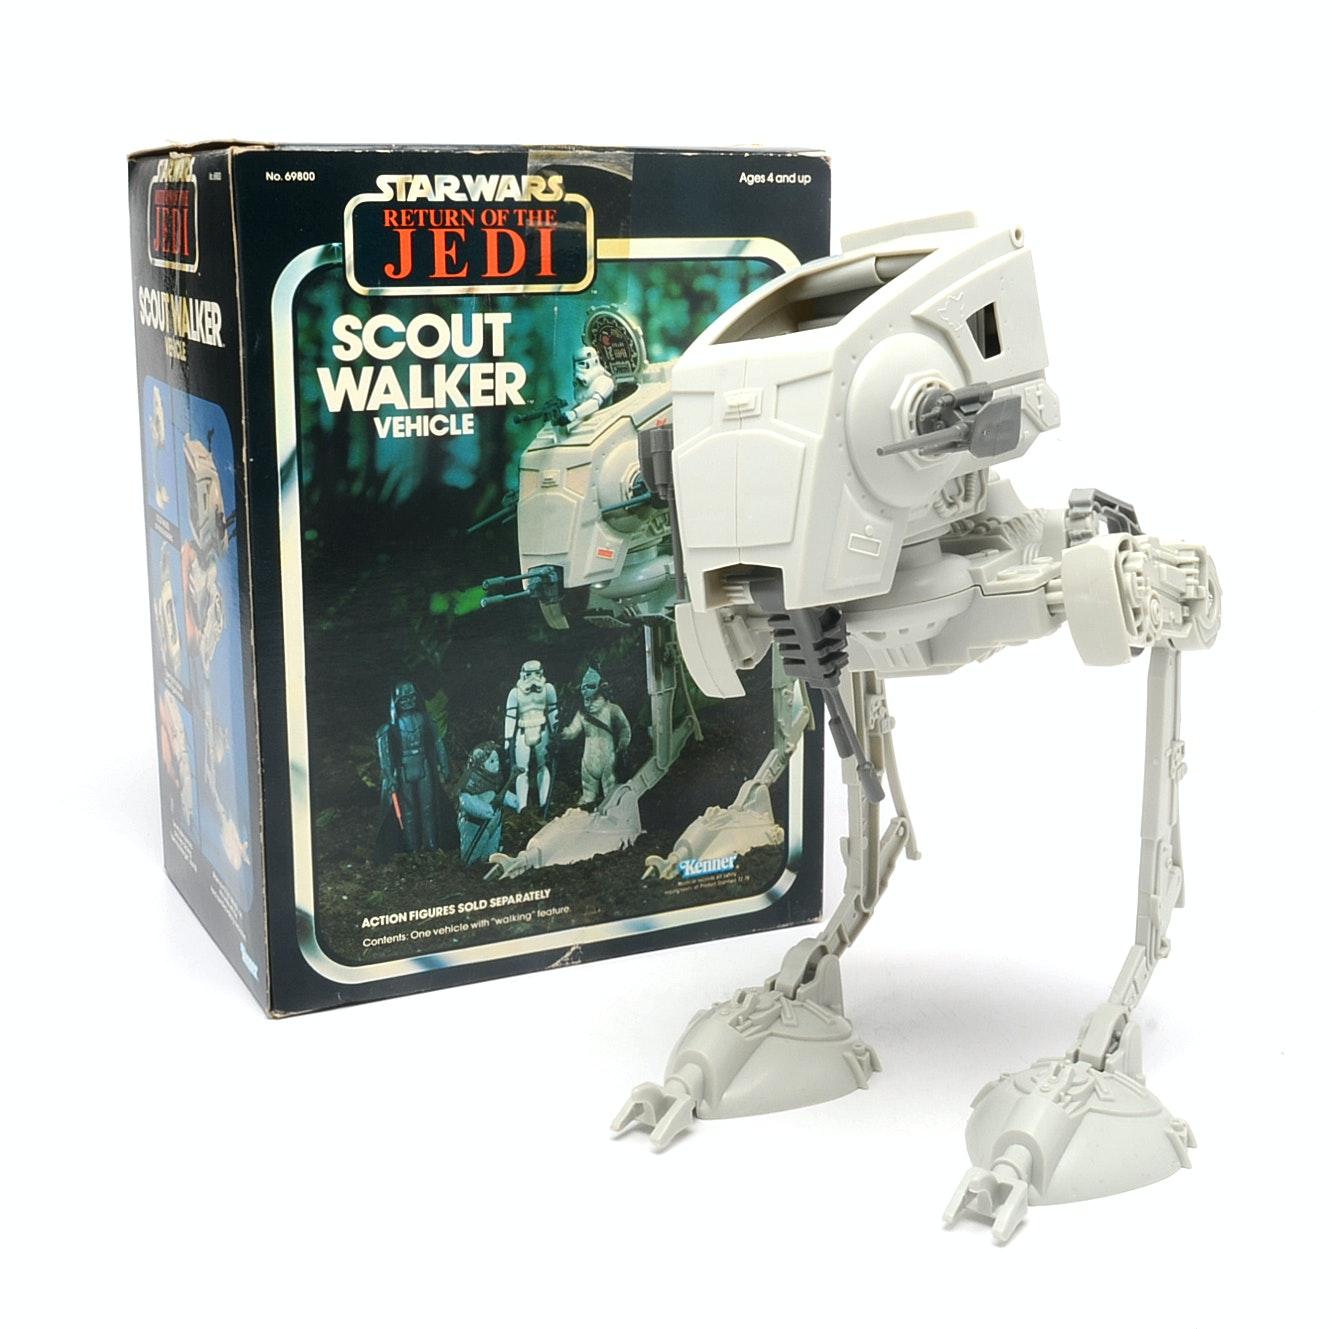 1983 Star Wars Scout Walker Vehicle Toy